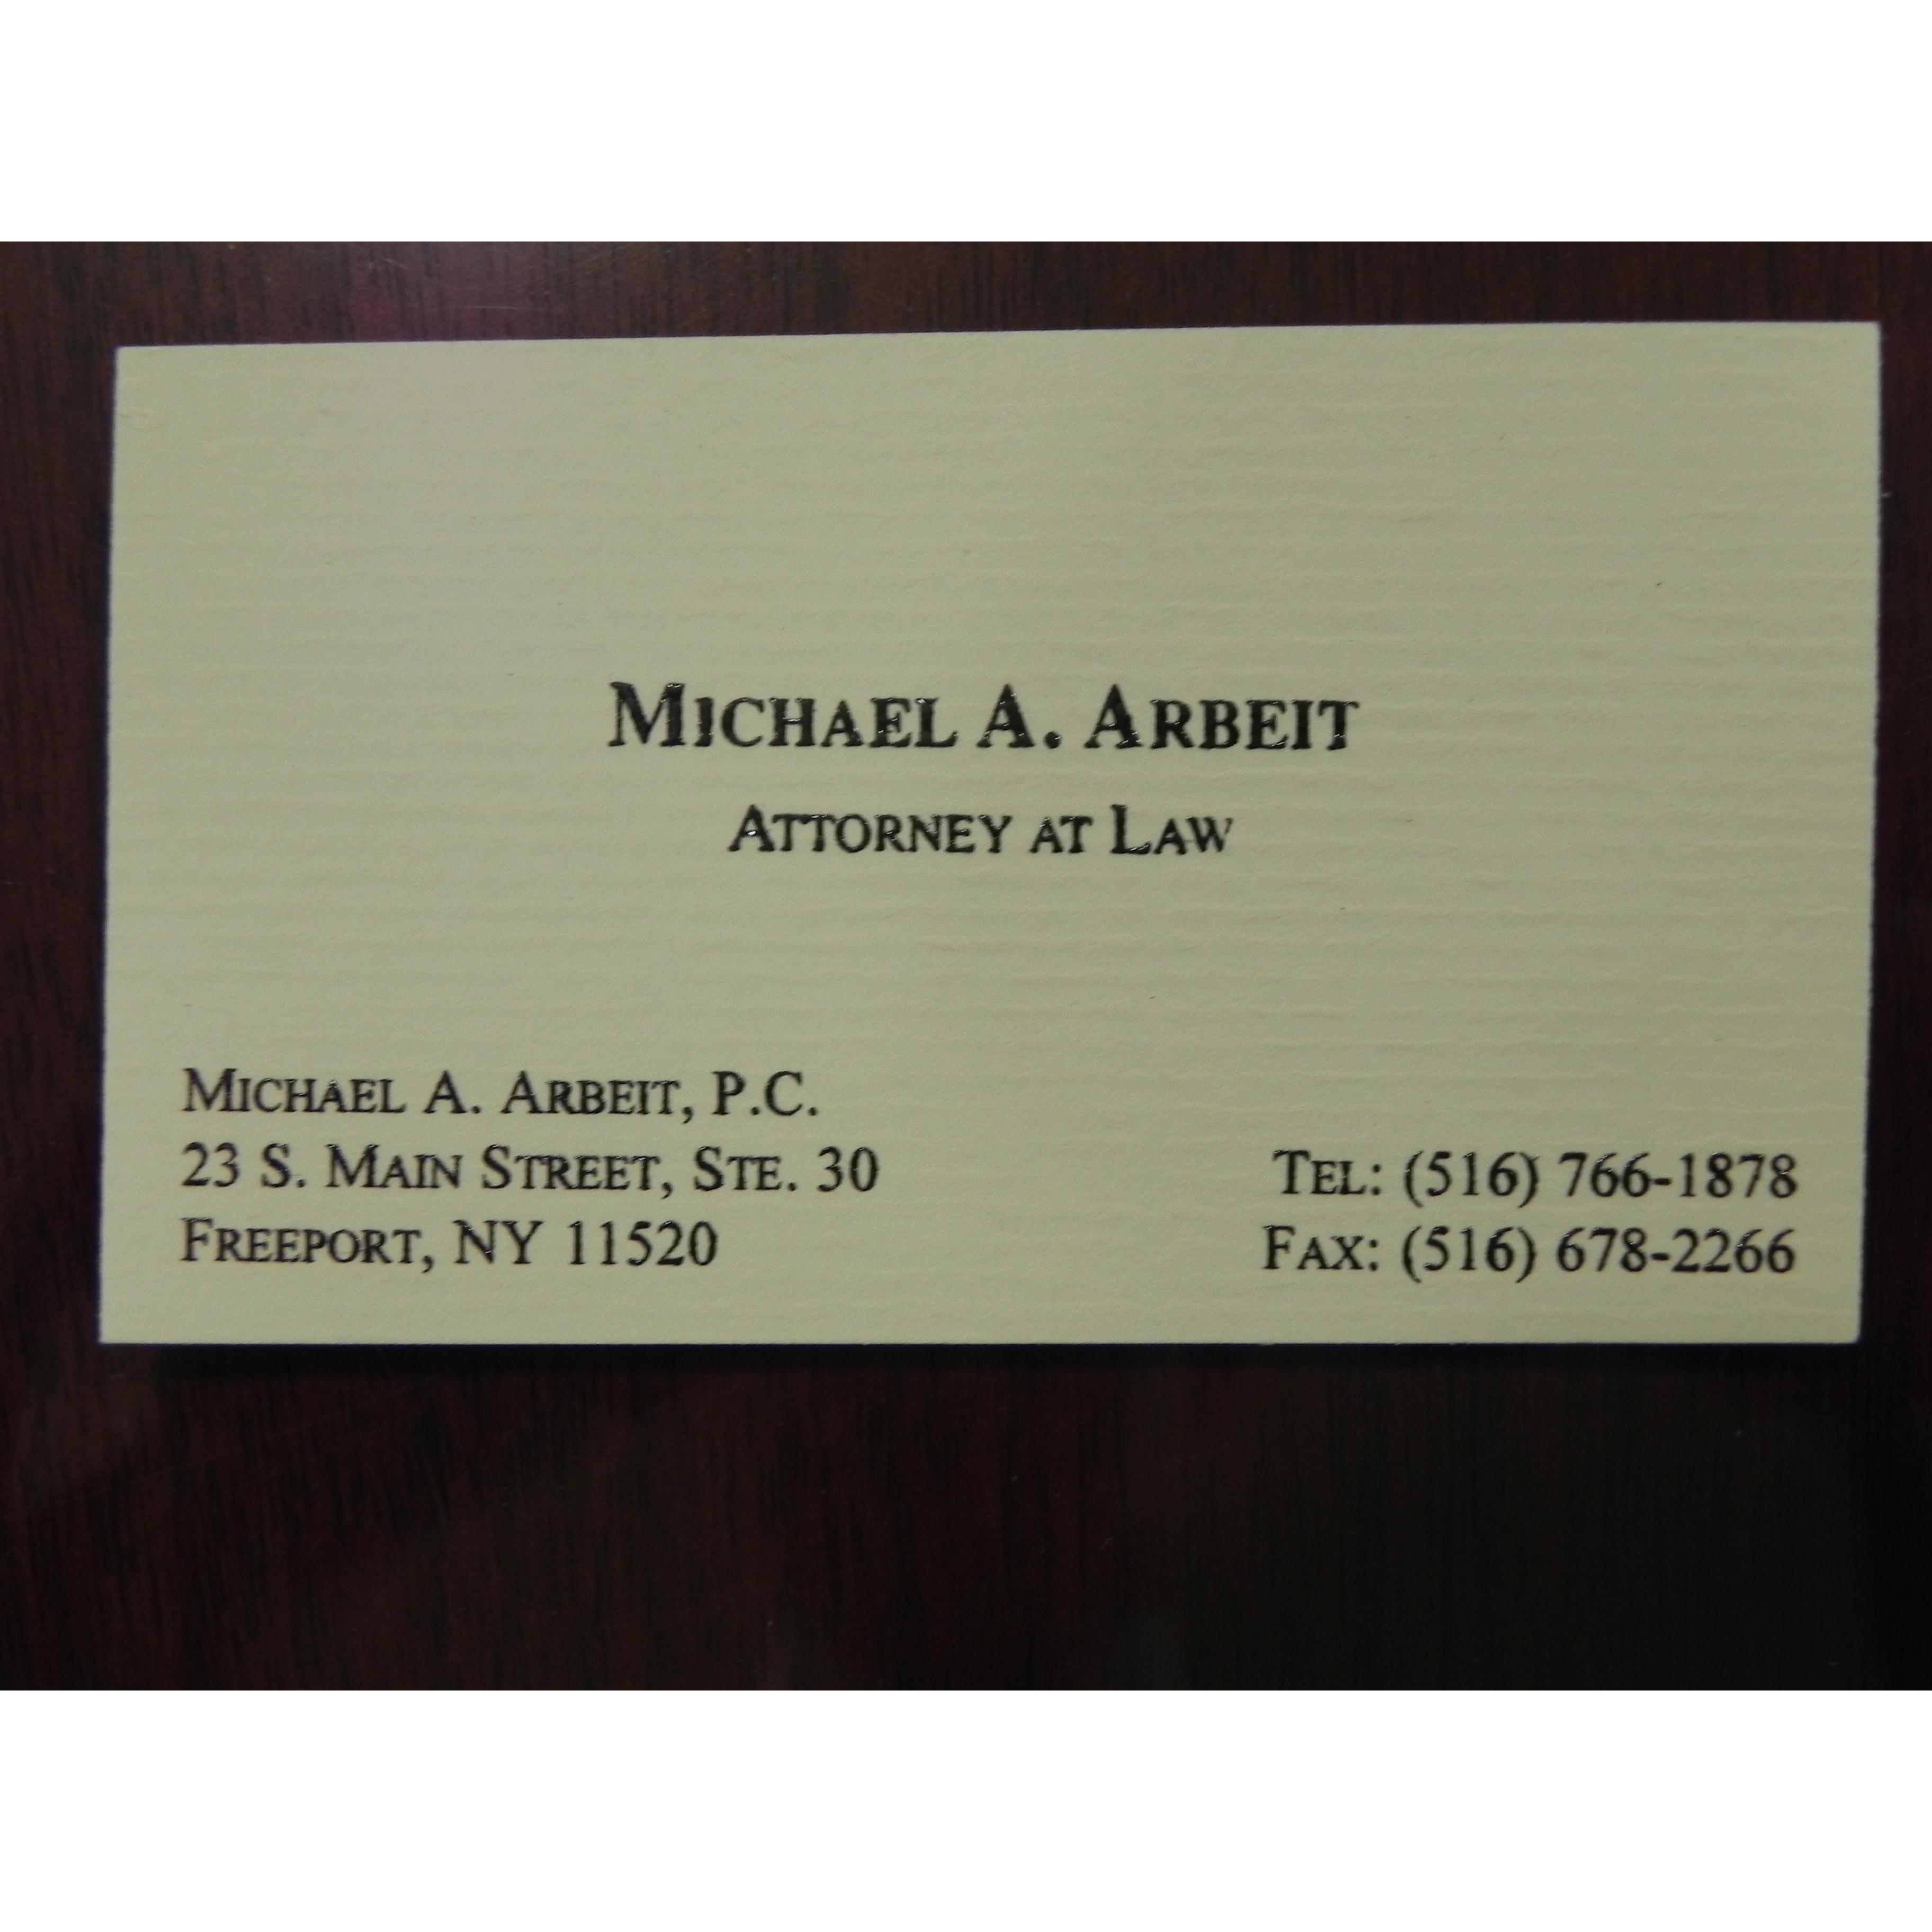 Michael A. Arbeit, P.C